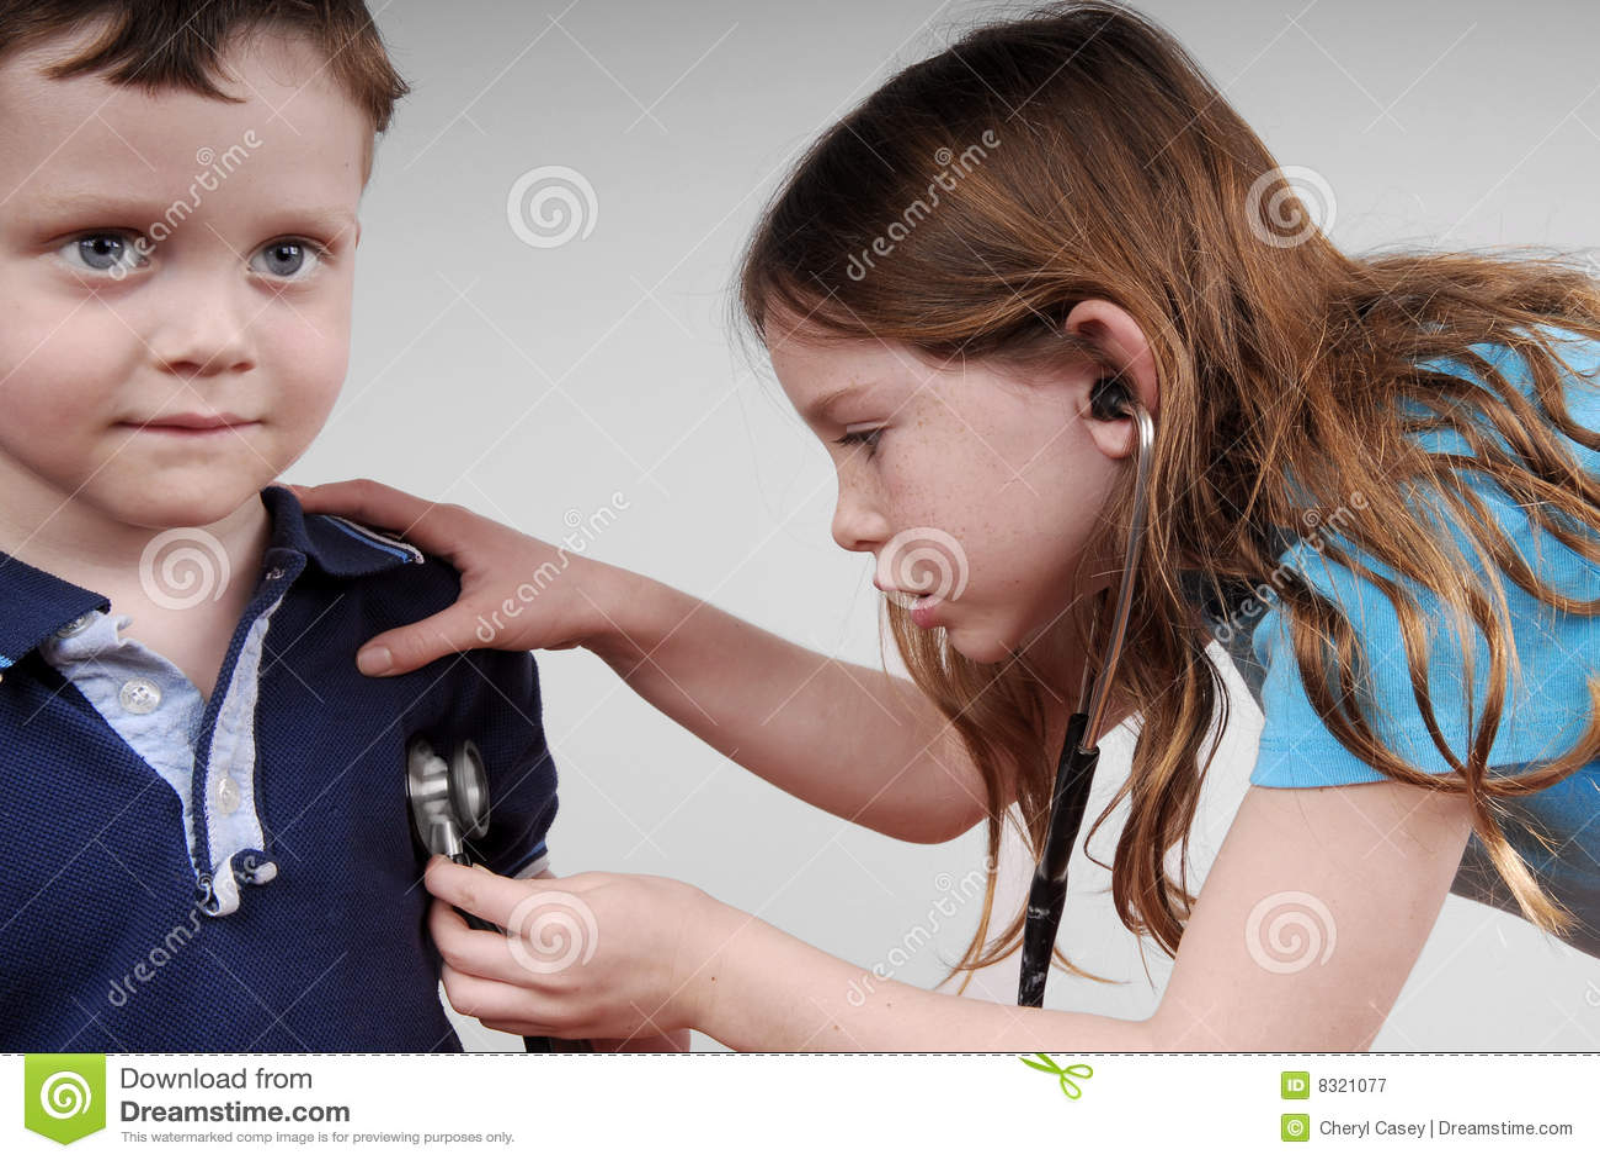 doktor spielen